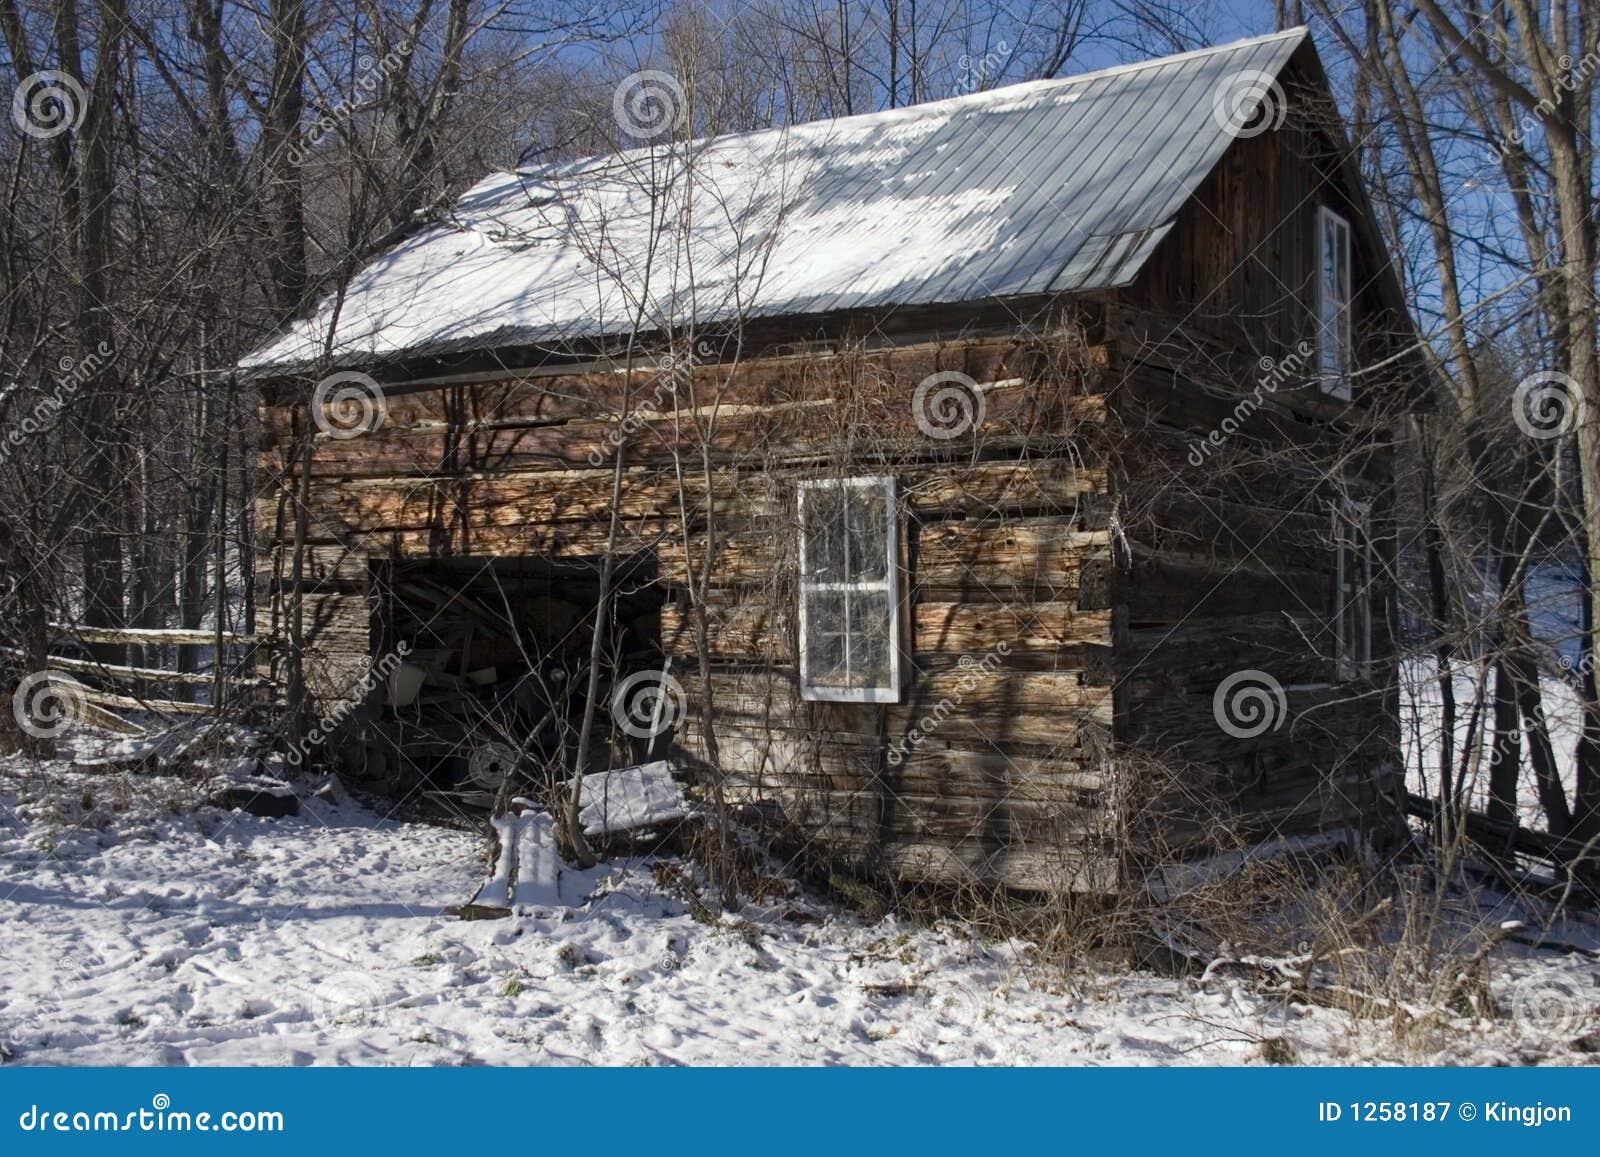 vieille cabane en bois image stock image du hiver glace 1258187. Black Bedroom Furniture Sets. Home Design Ideas